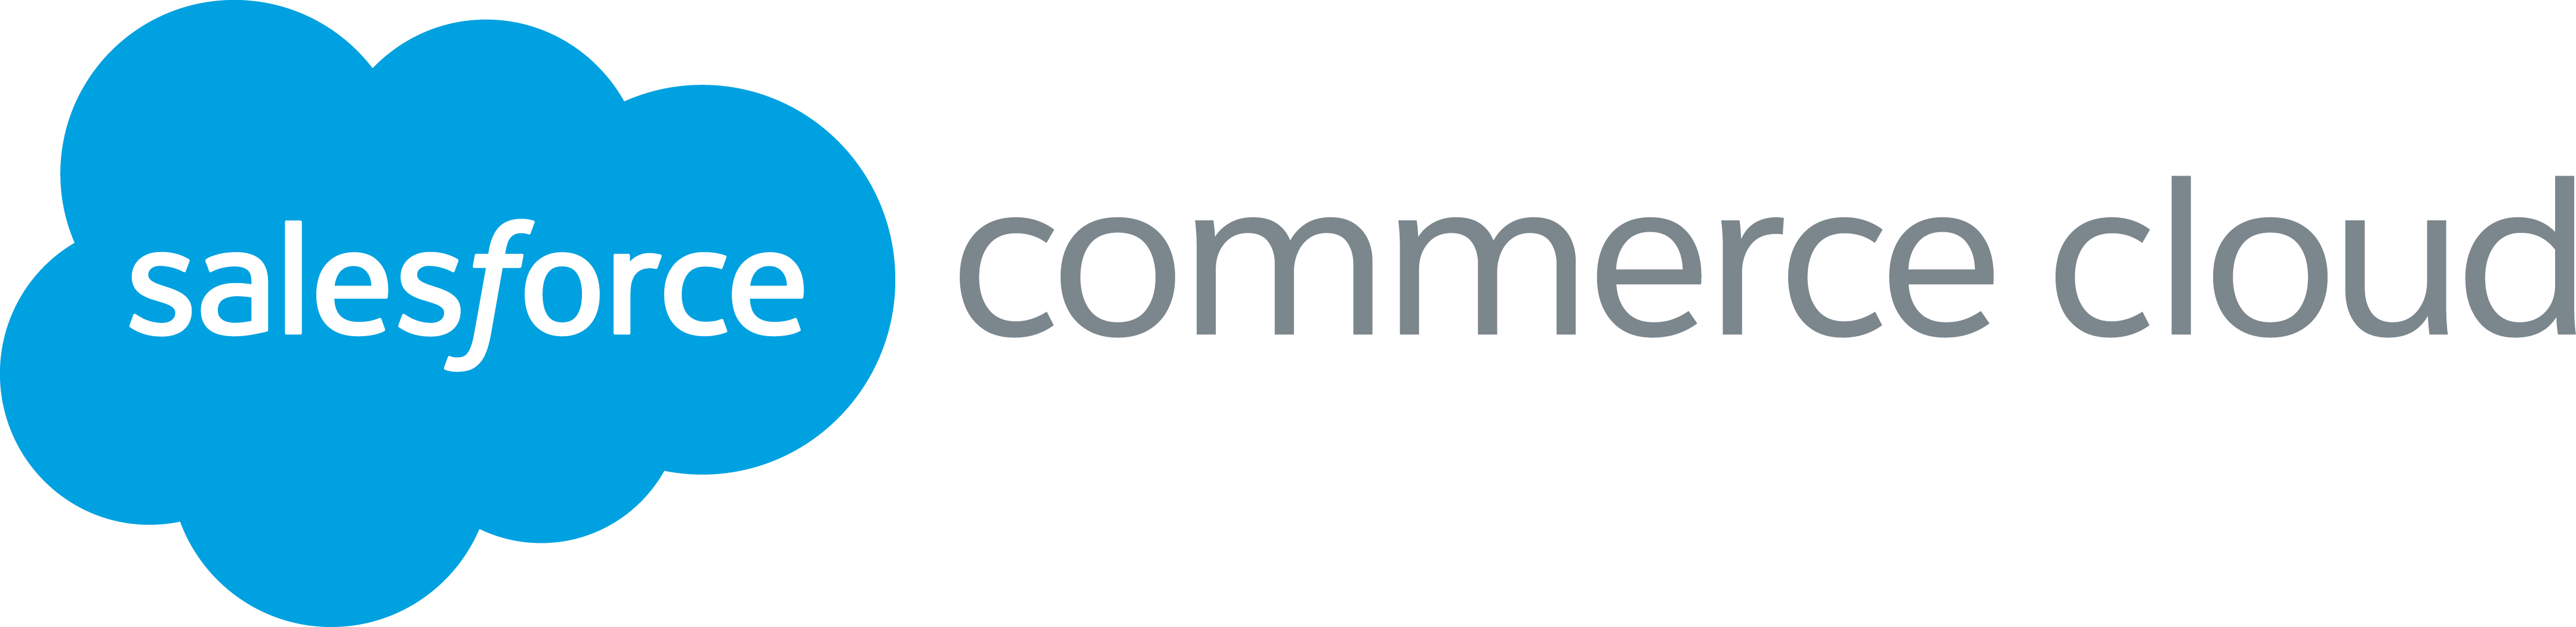 2016sf_CommerceCloud_logo_RGB